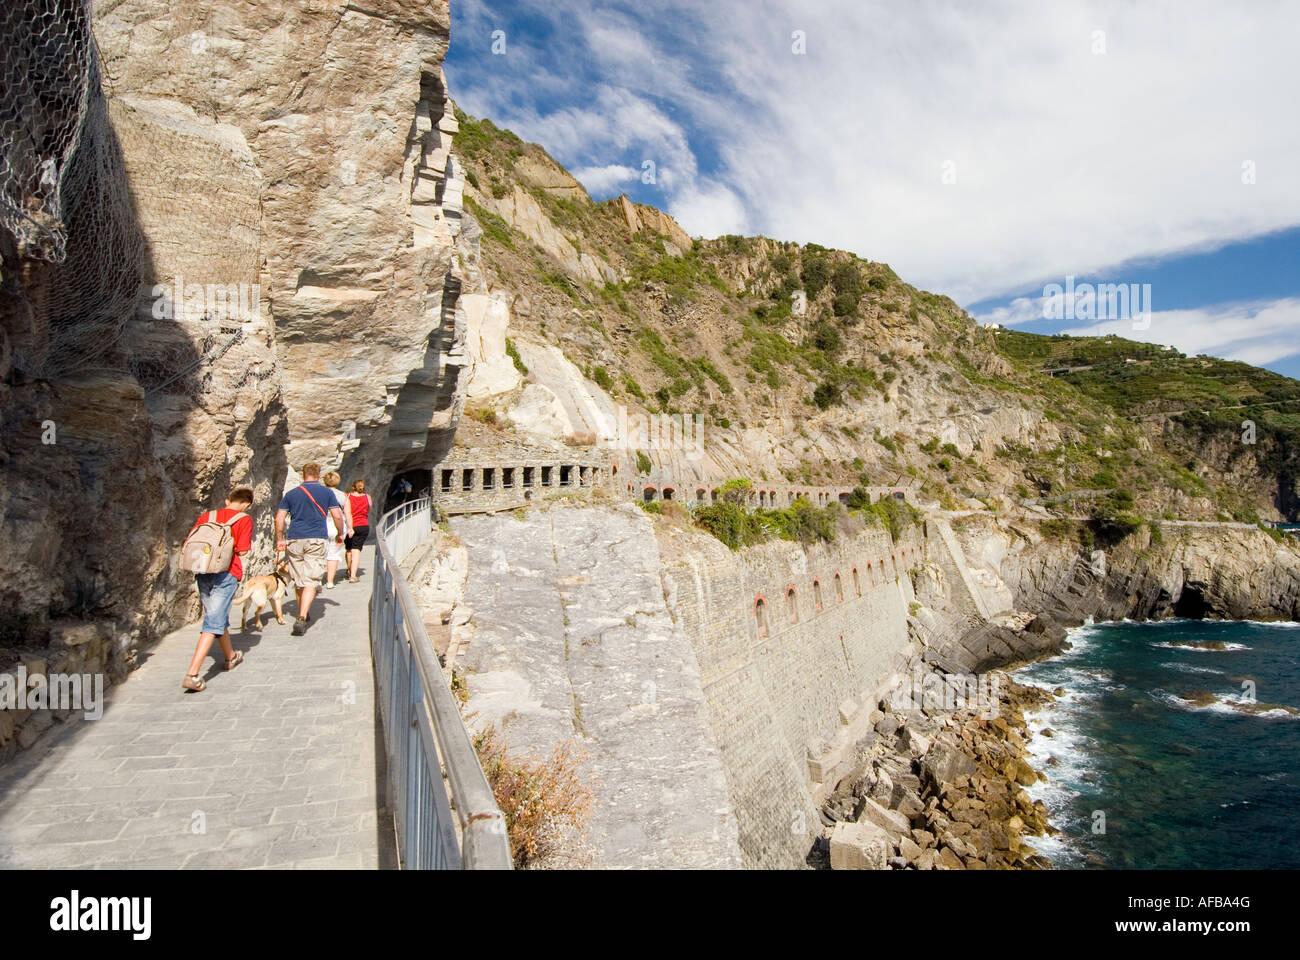 Via Dell Amore trail between the villages of Manarola and Riomaggiore Cinque Terre Italy - Stock Image